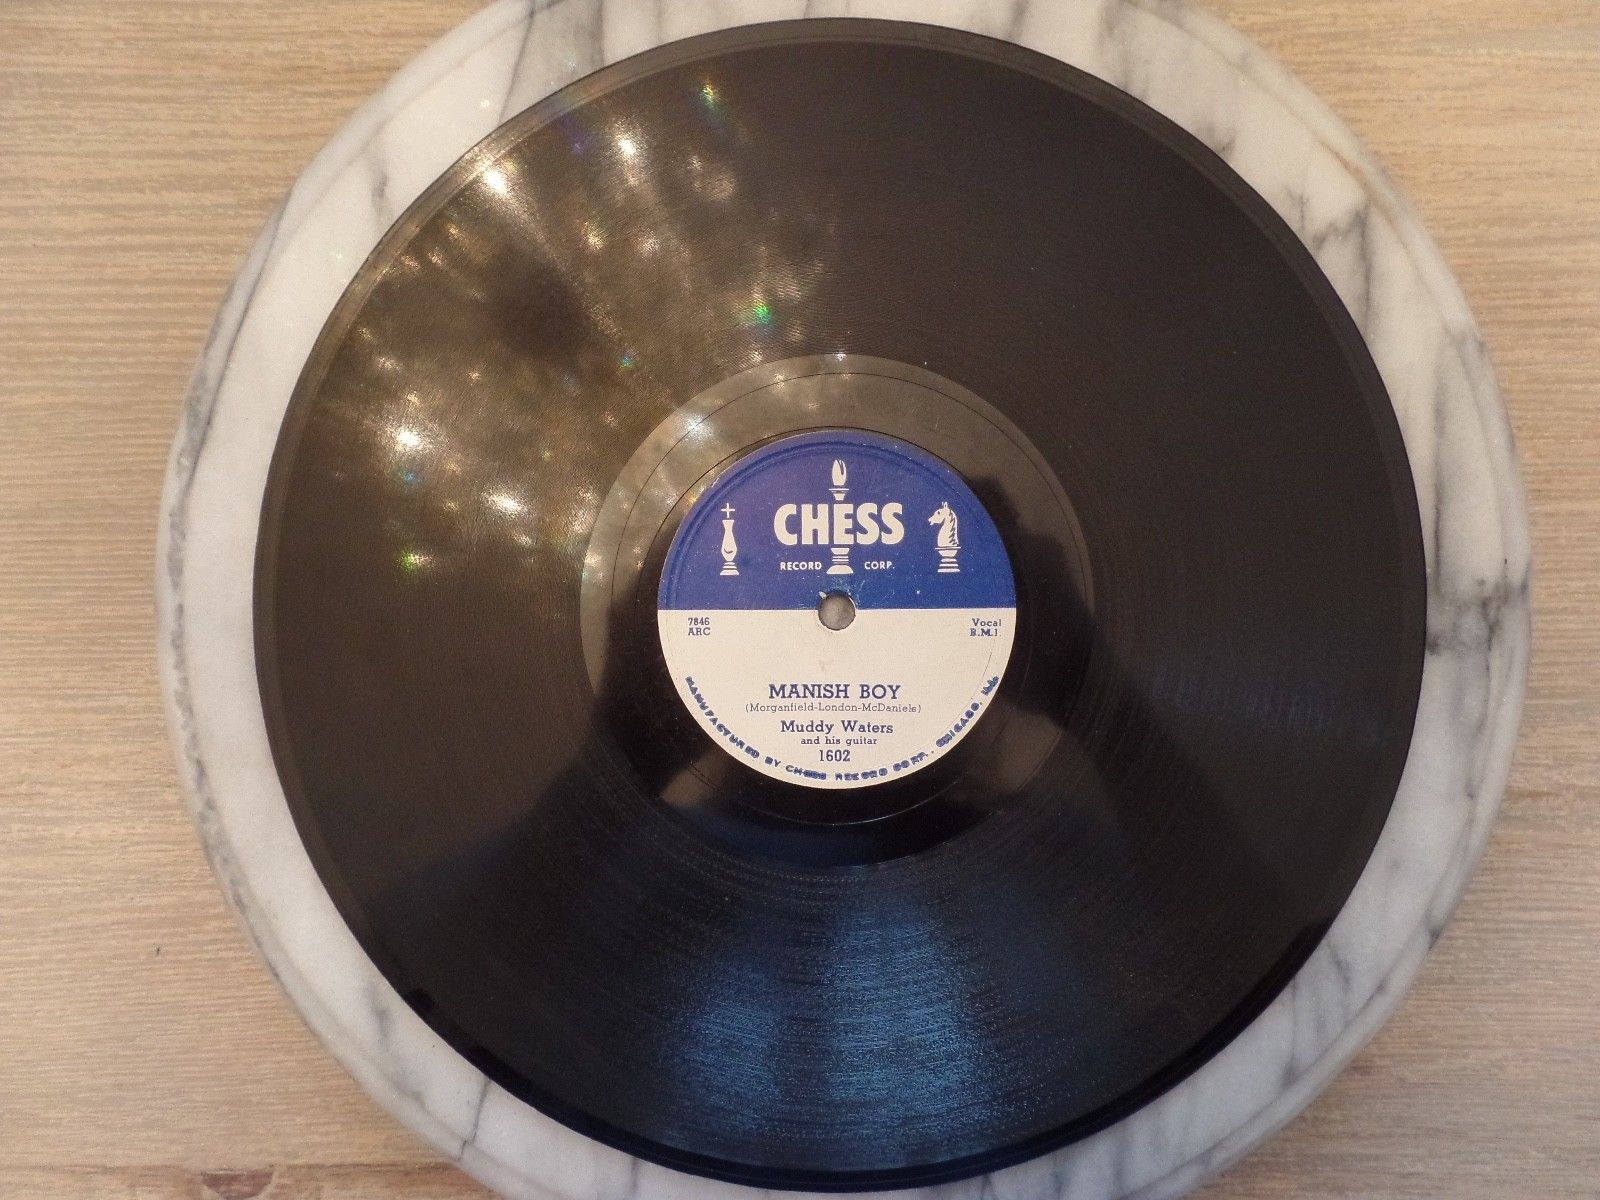 78 RPM Chess 1602 Muddy Waters Manish Boy / Young Fashion Ways